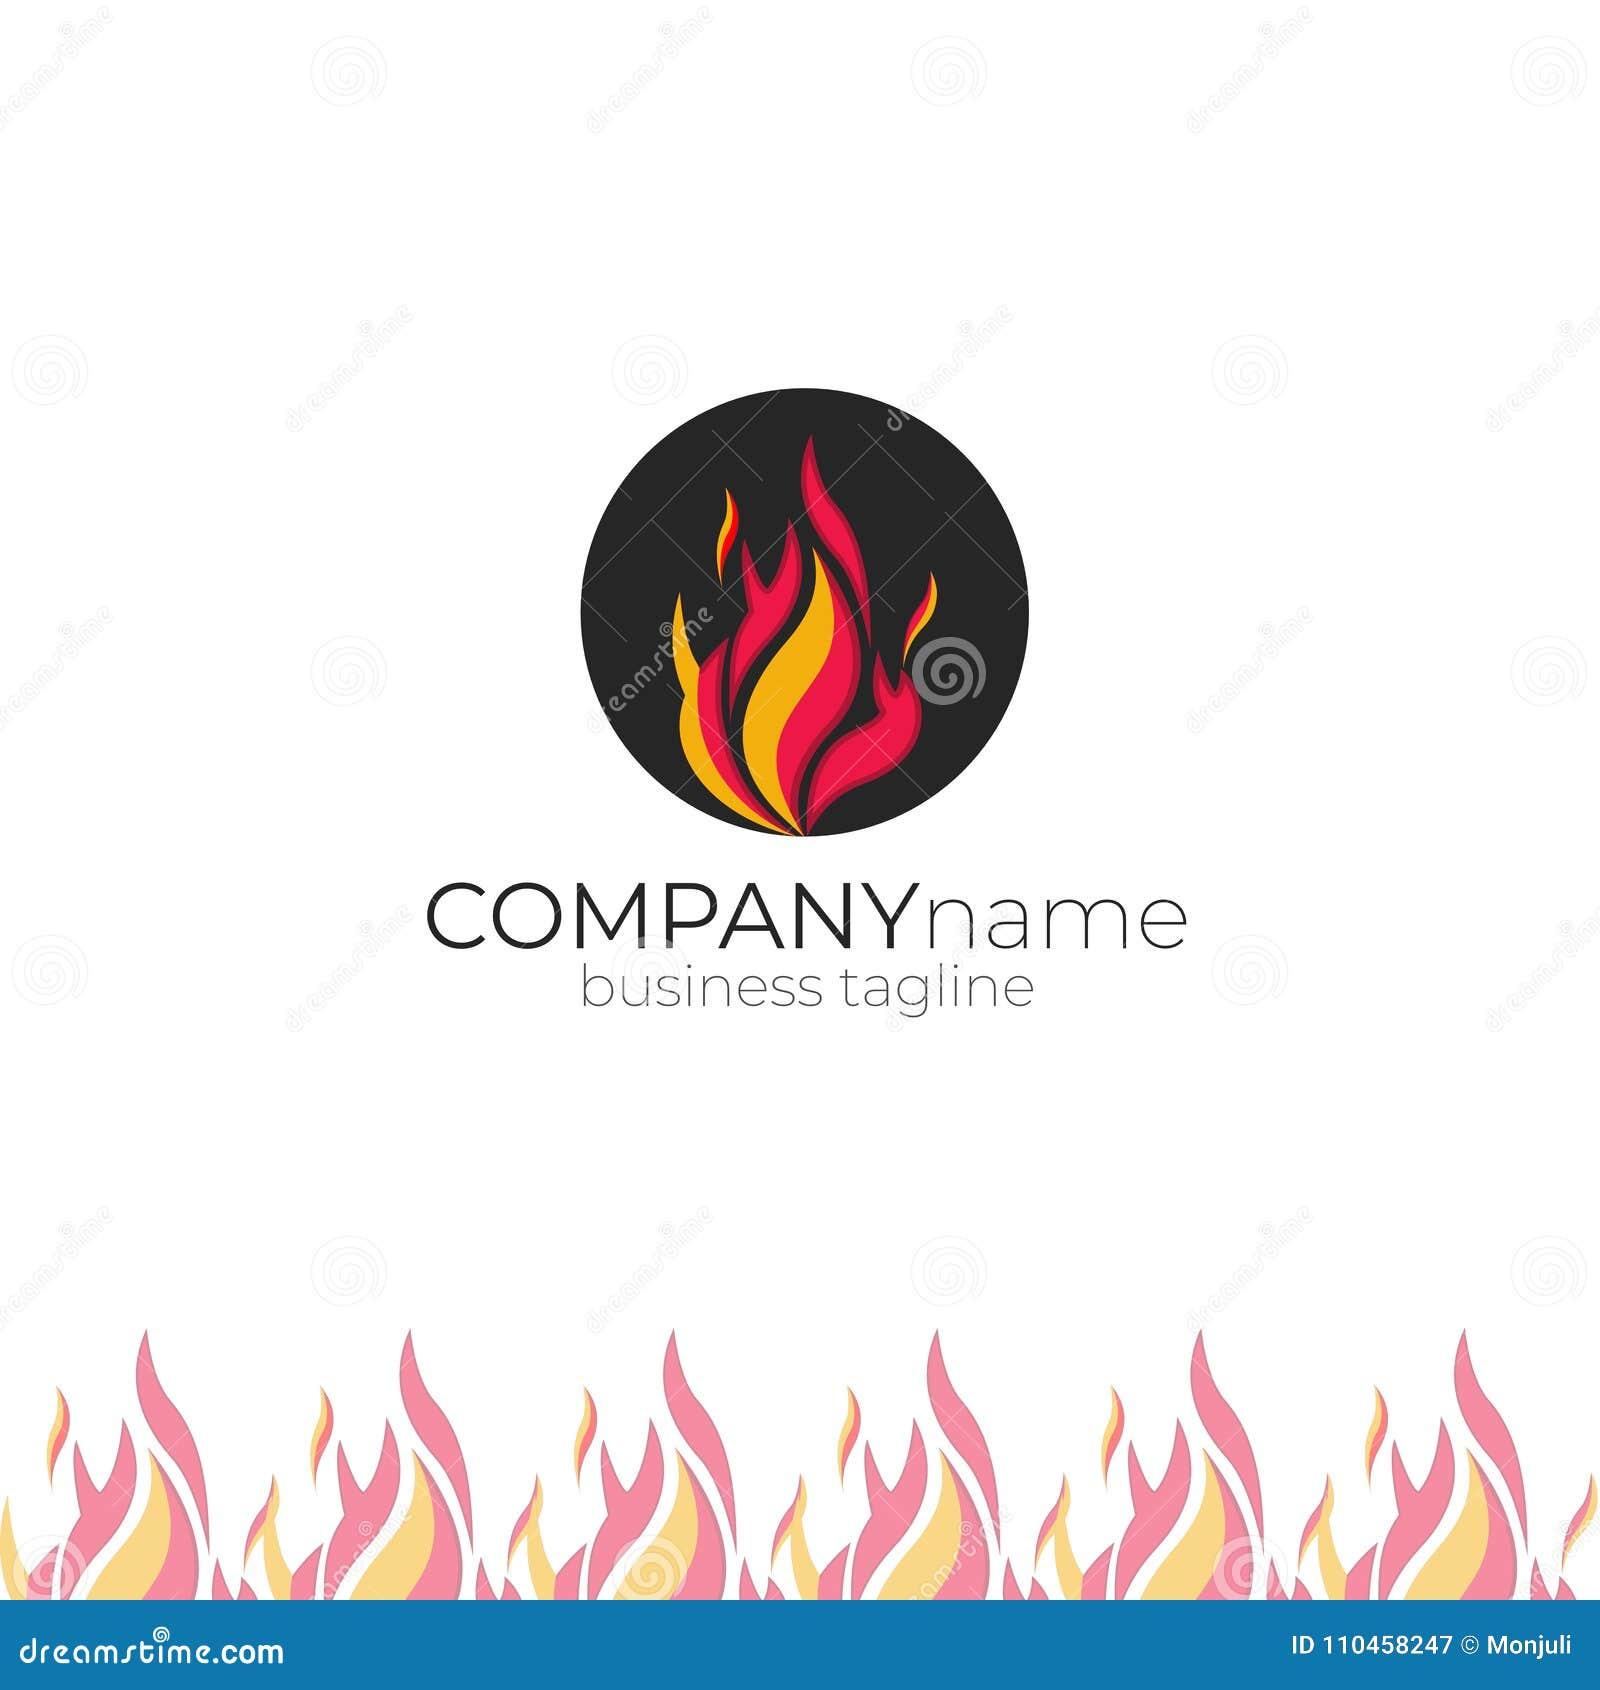 fire logo fireman chimney sweep logo stock image illustration